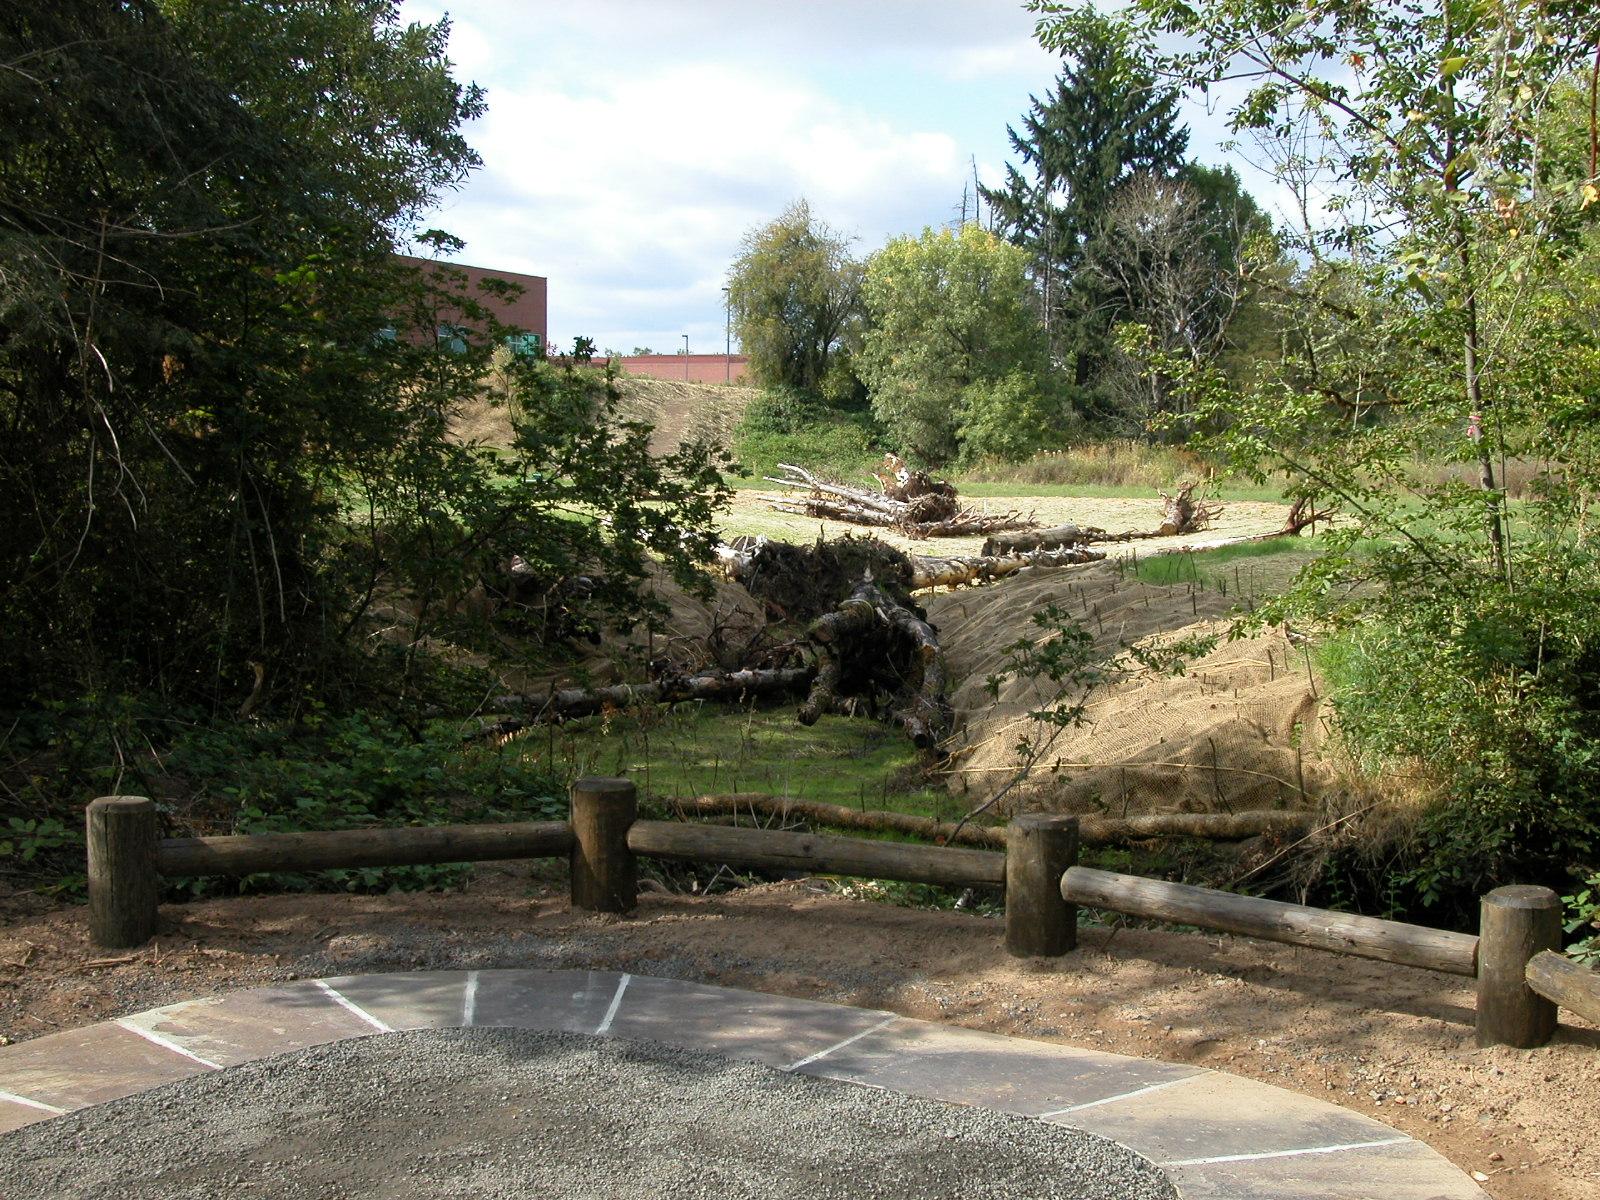 newly built rock creek trail improvements: fence, path, nurse logs